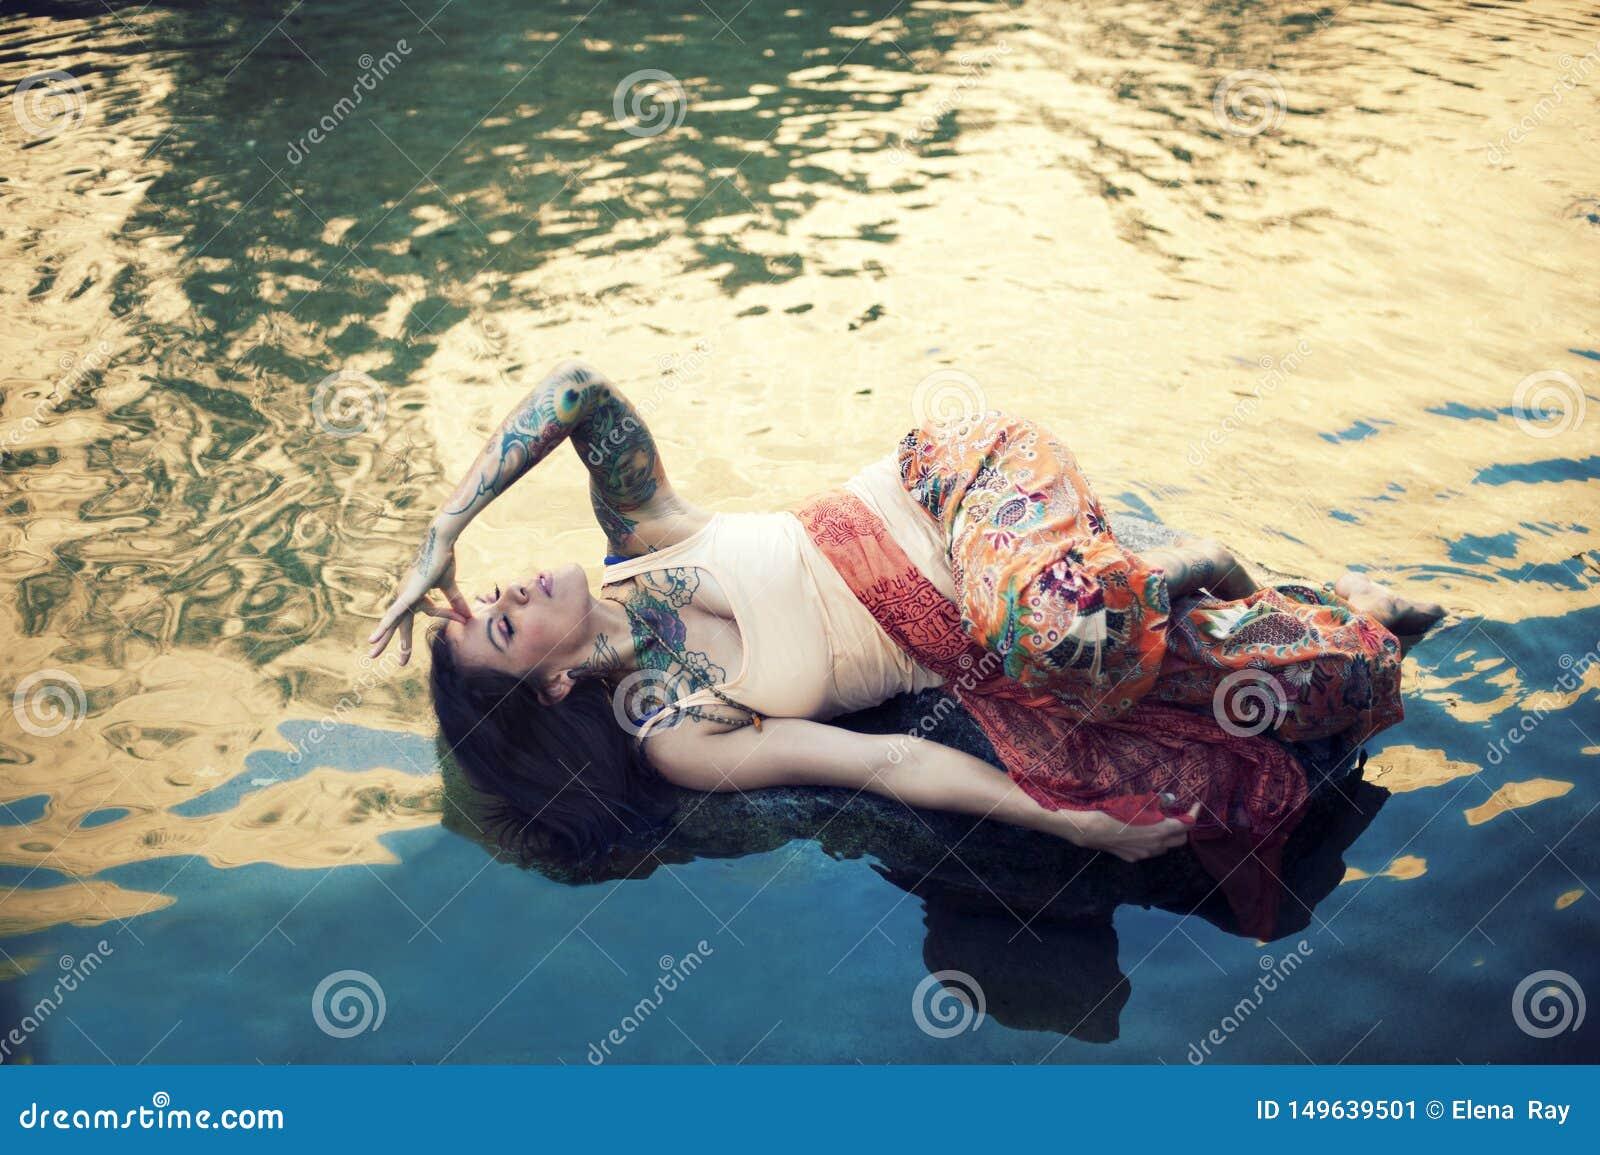 Yoga Nidra Dreamer Woman Stock Image Image Of Emotive 149639501